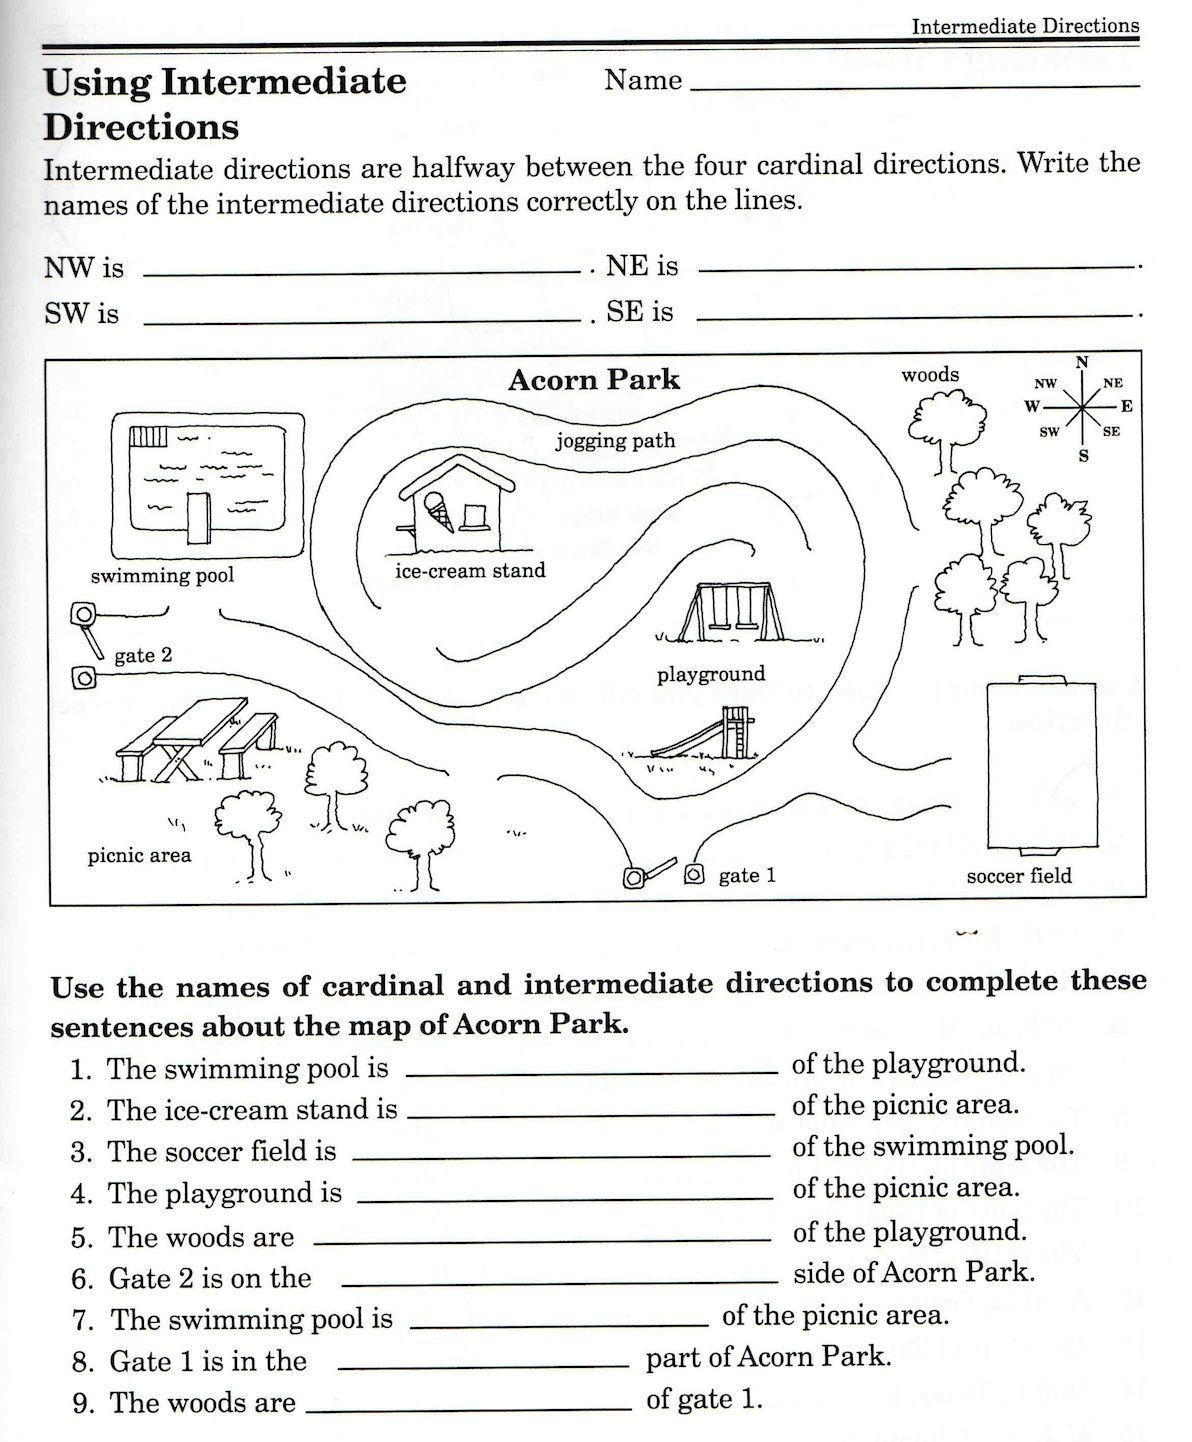 medium resolution of 3 Cardinal Direction Map Skills Worksheet Christina Javier rchjelzea on  Pinterest   Map skills worksheets